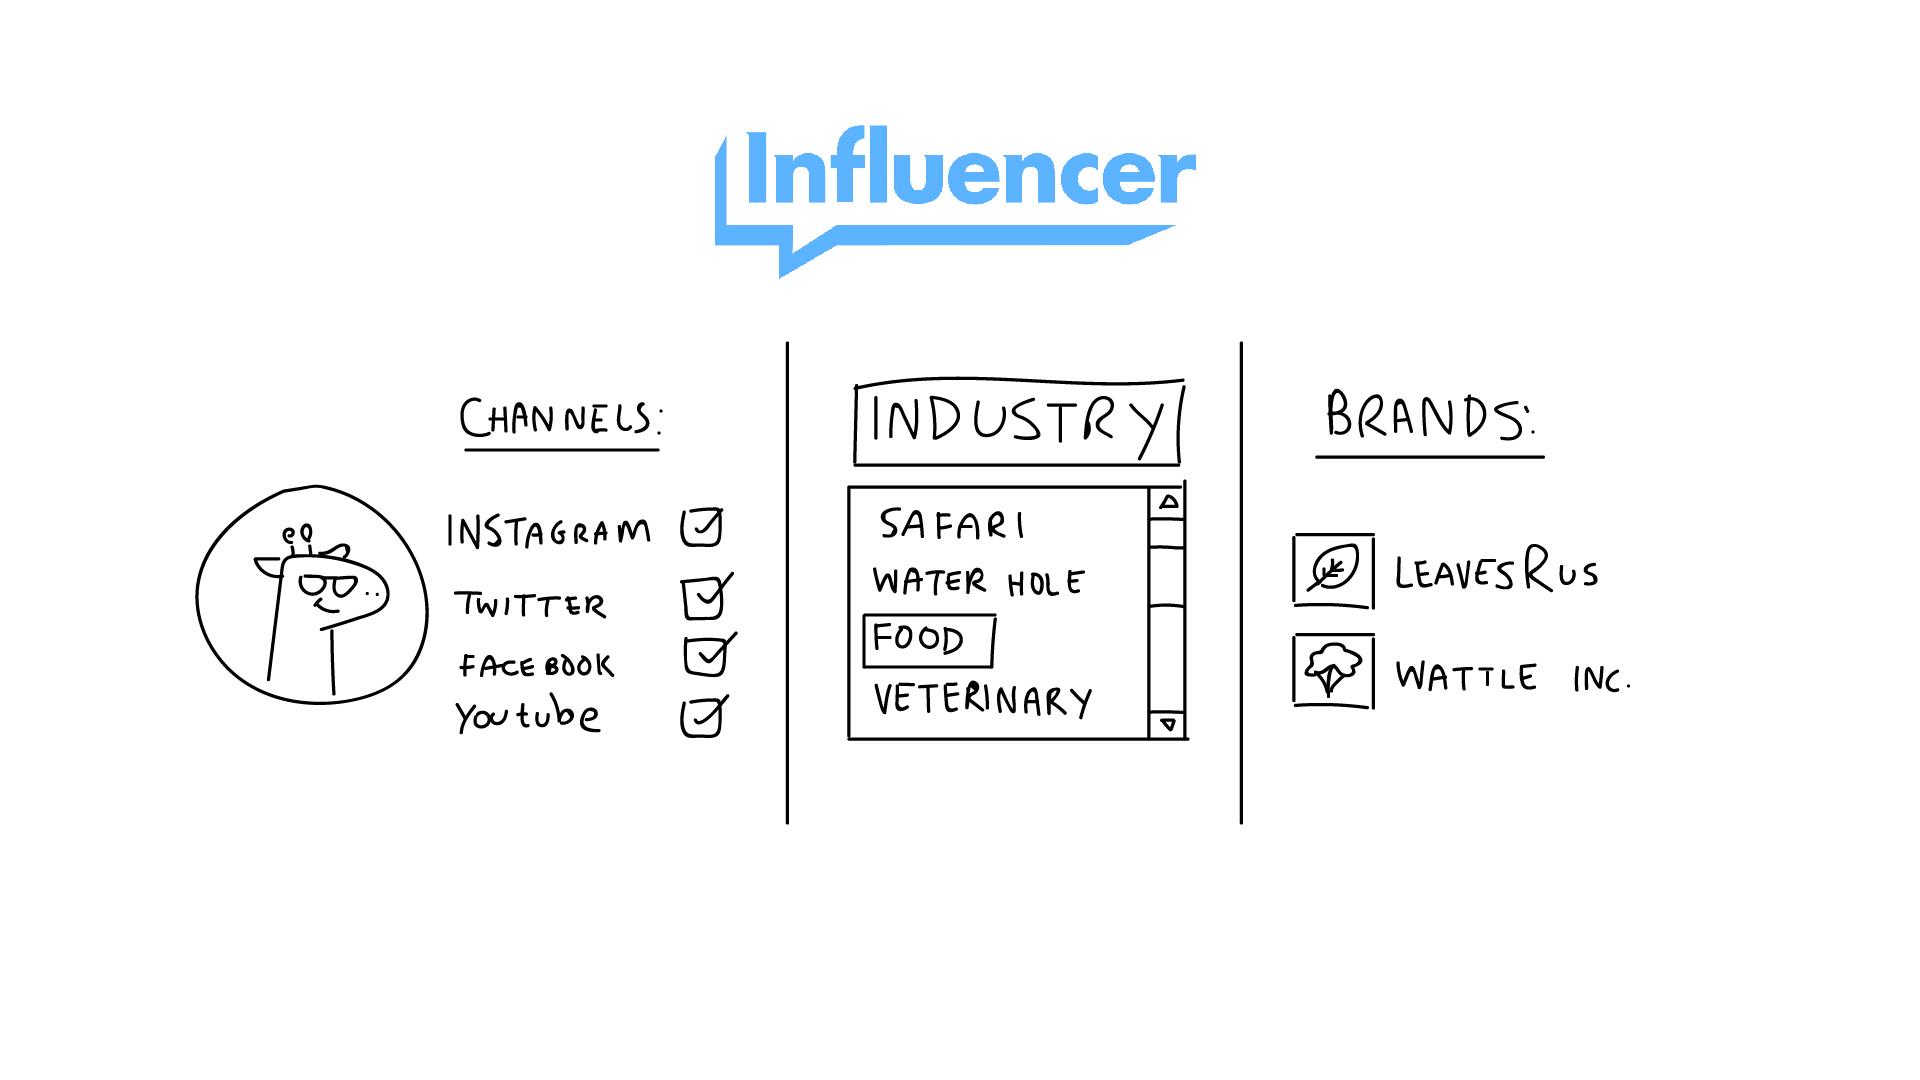 InfluencerArtboard 1 copy 6_Storyboards.jpg